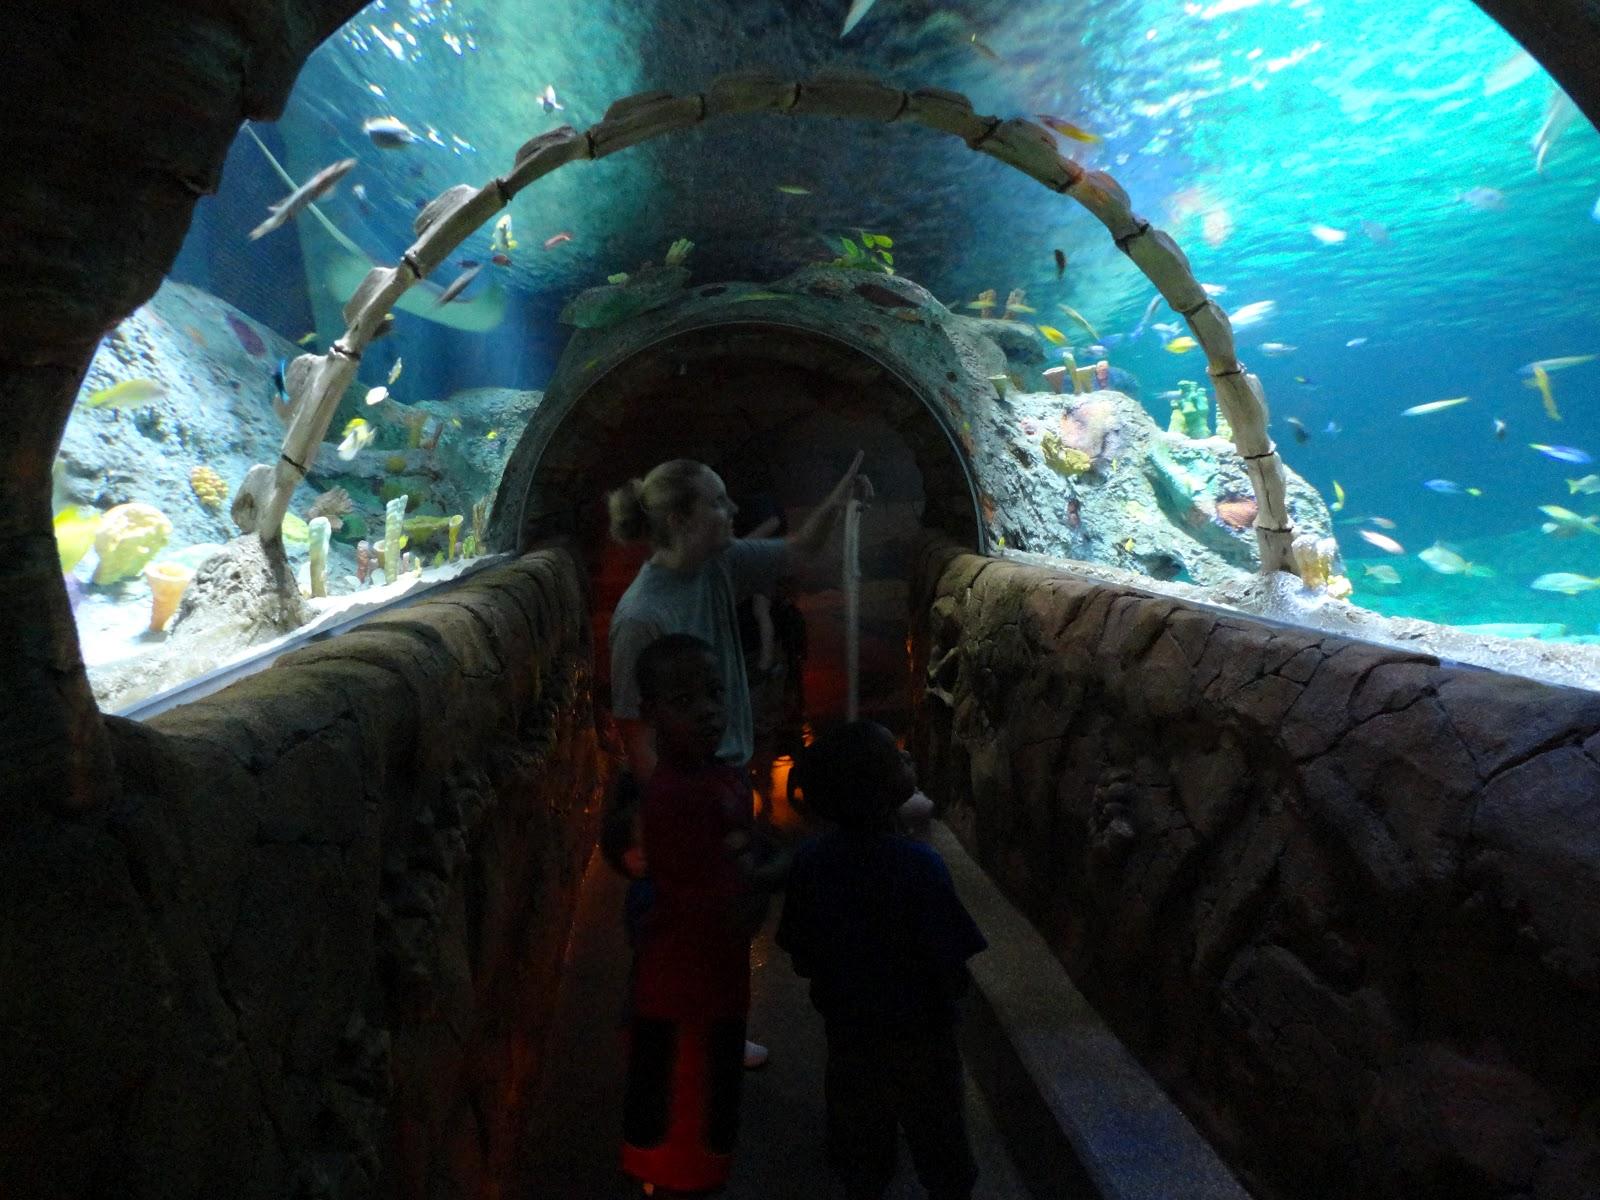 The Famn Damily Kansas City Aquarium